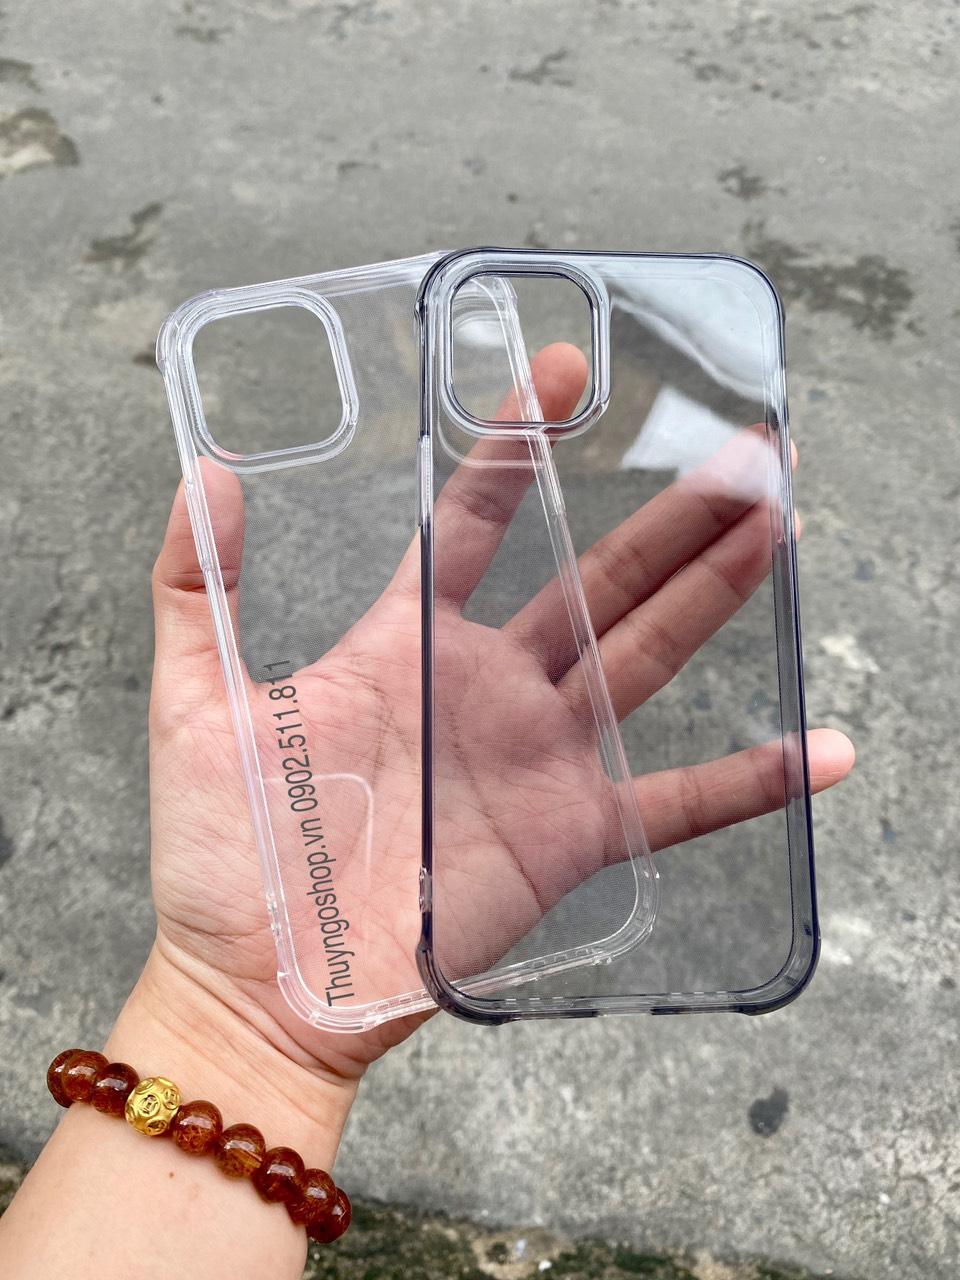 Ốp dẻo chống sốc LEEU - Iphone 12 mini